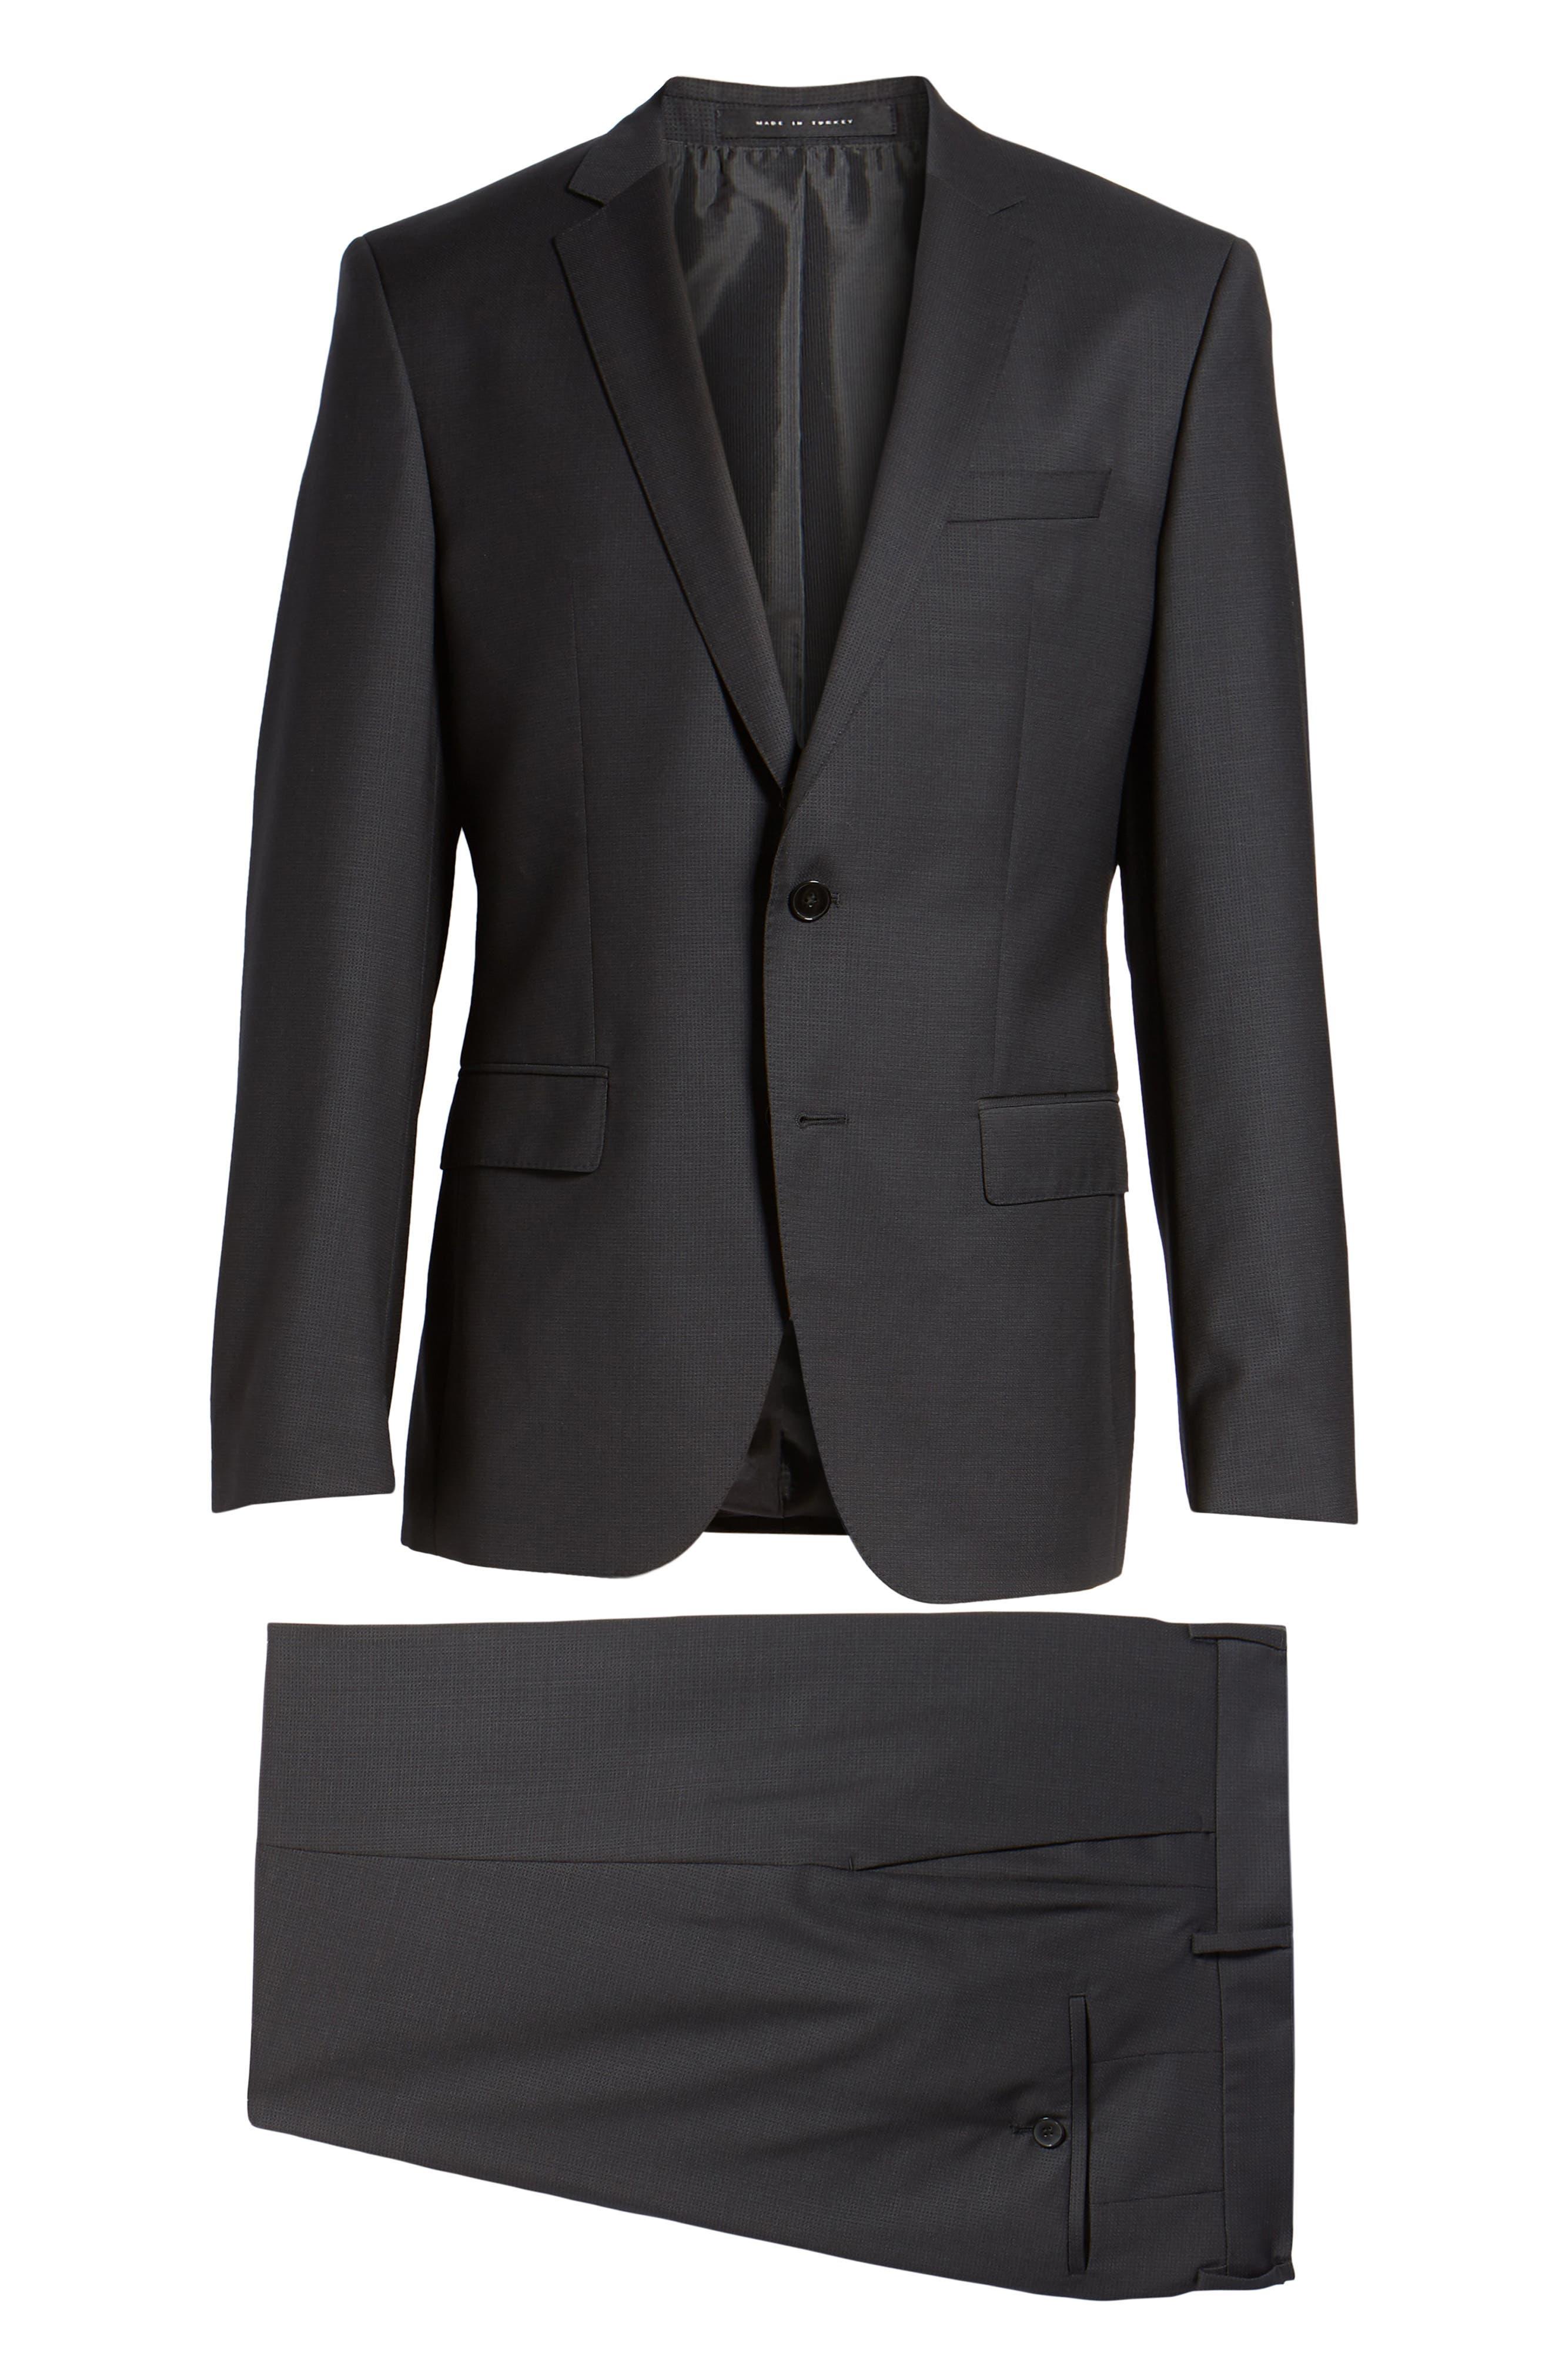 'Huge/Genius' Trim Fit Solid Wool Suit,                             Alternate thumbnail 8, color,                             BLACK